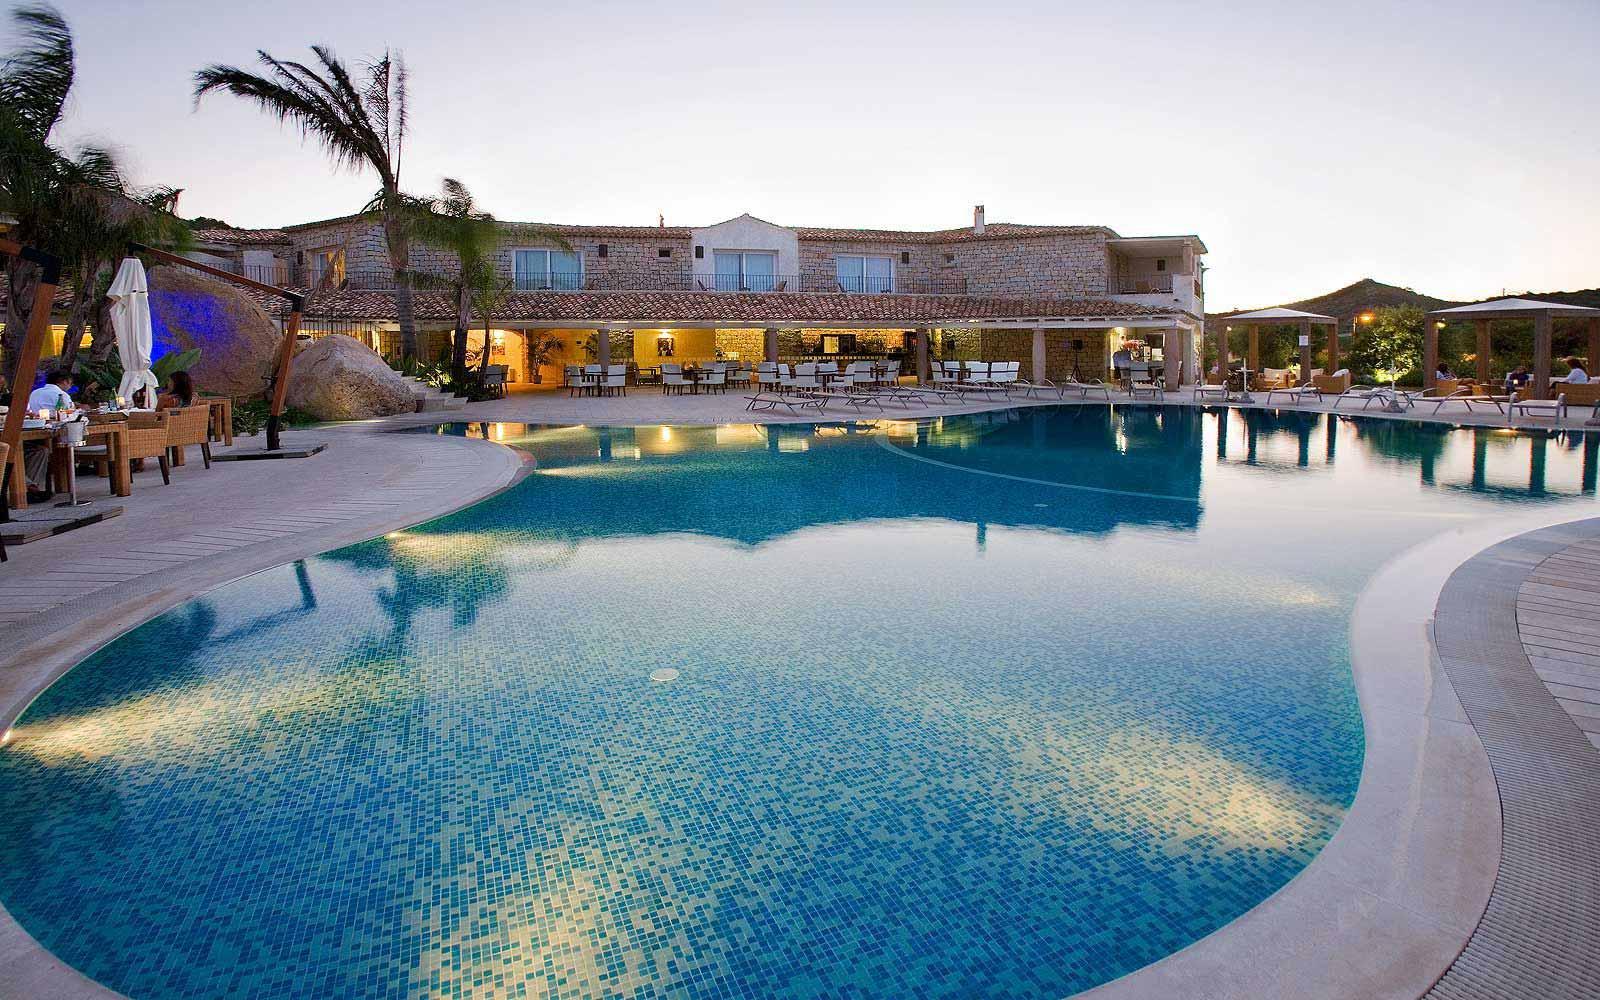 Swimming pool in the evening at Hotel Villas Resort